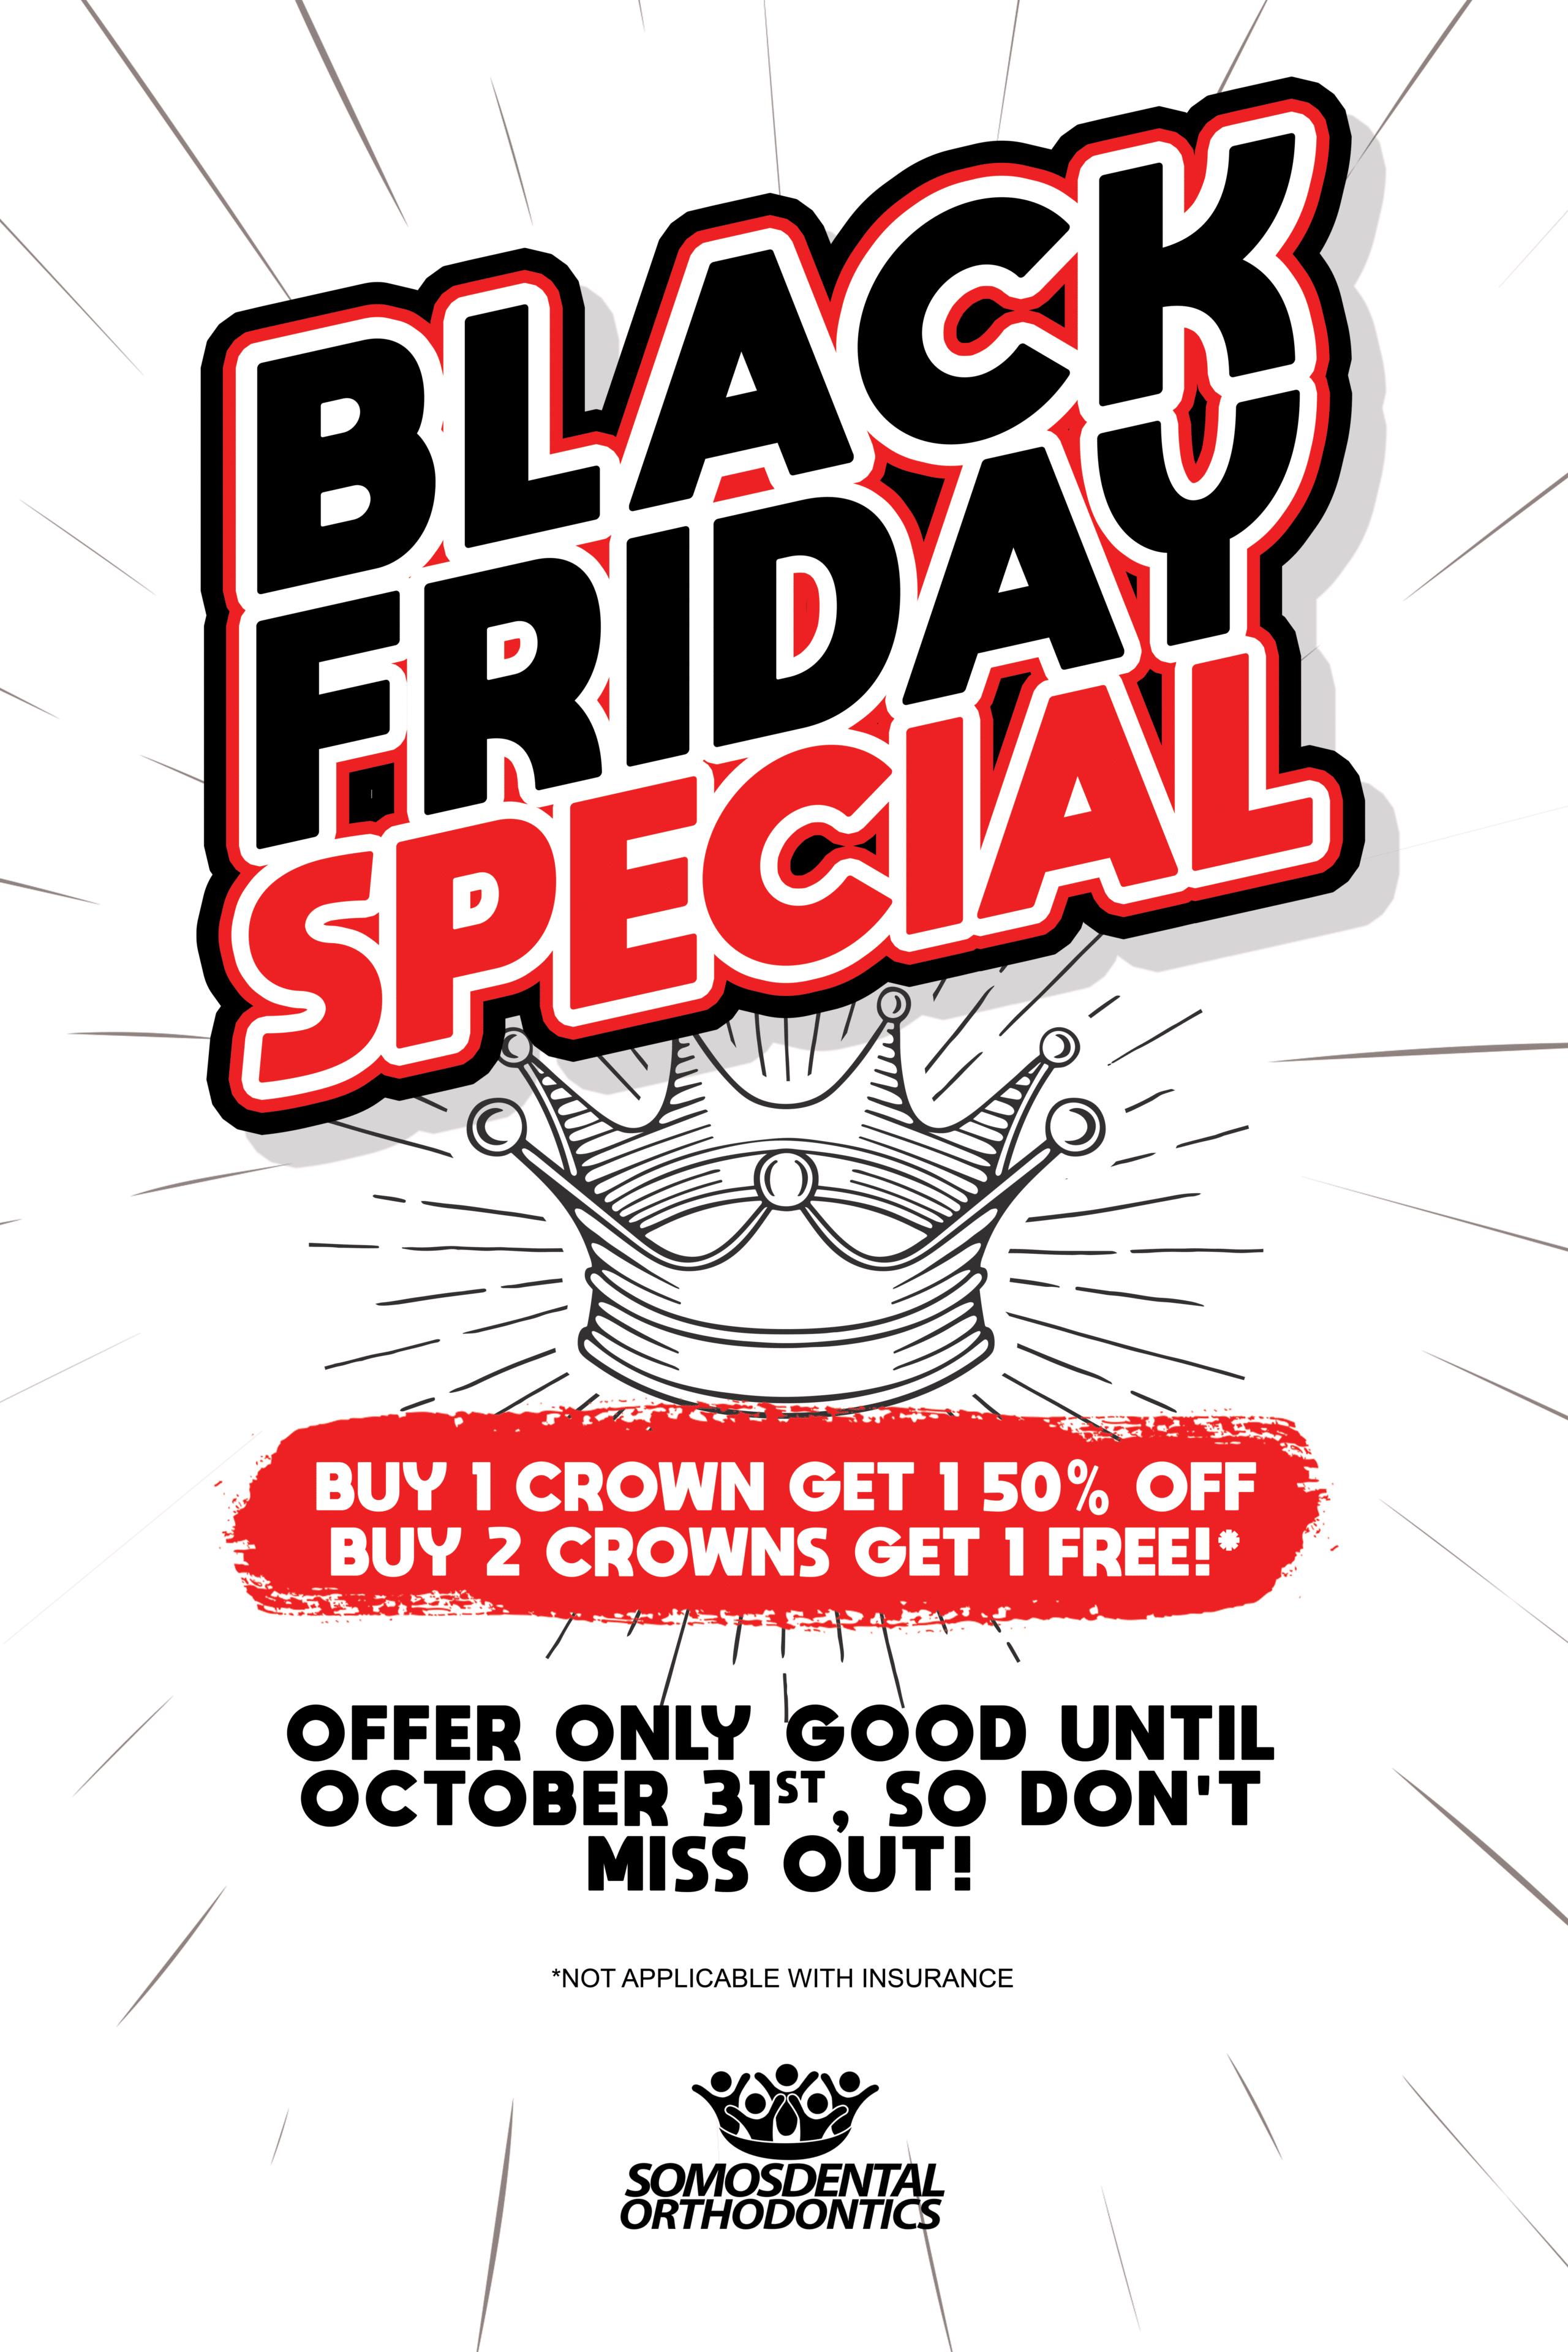 Somos Dental Black Friday Special on Crown